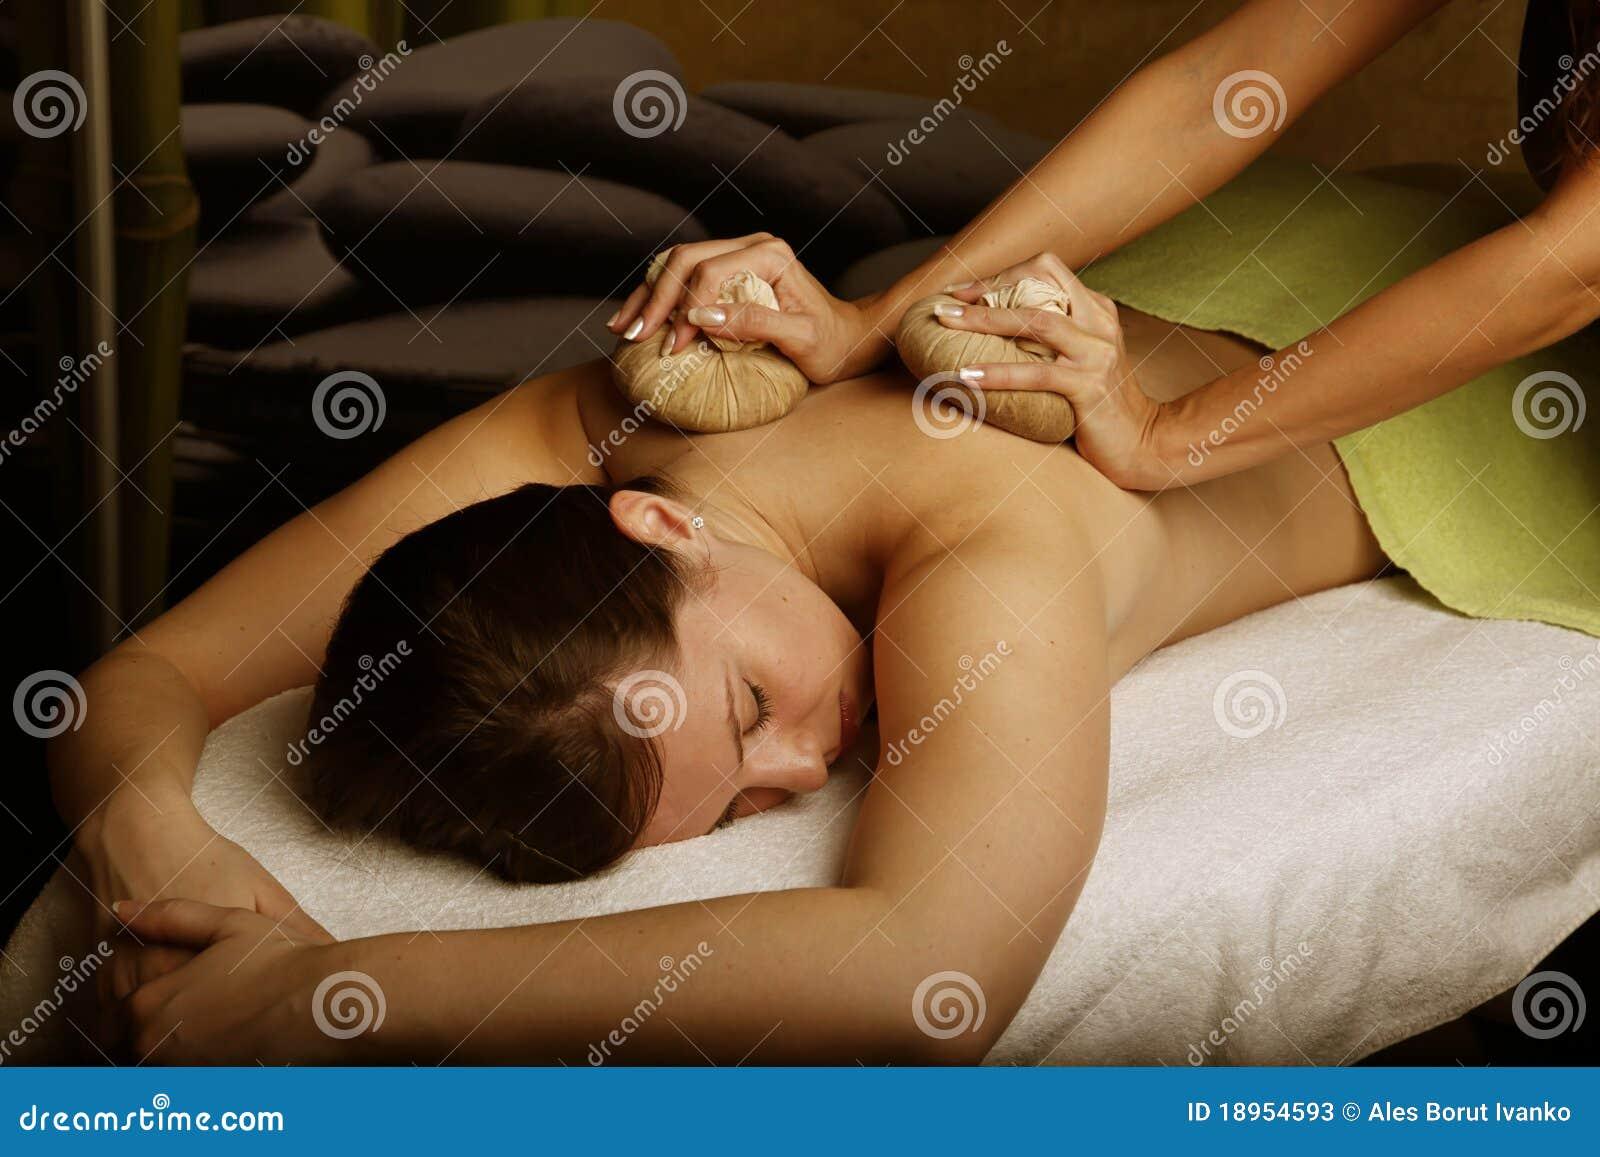 Woman having herbal message